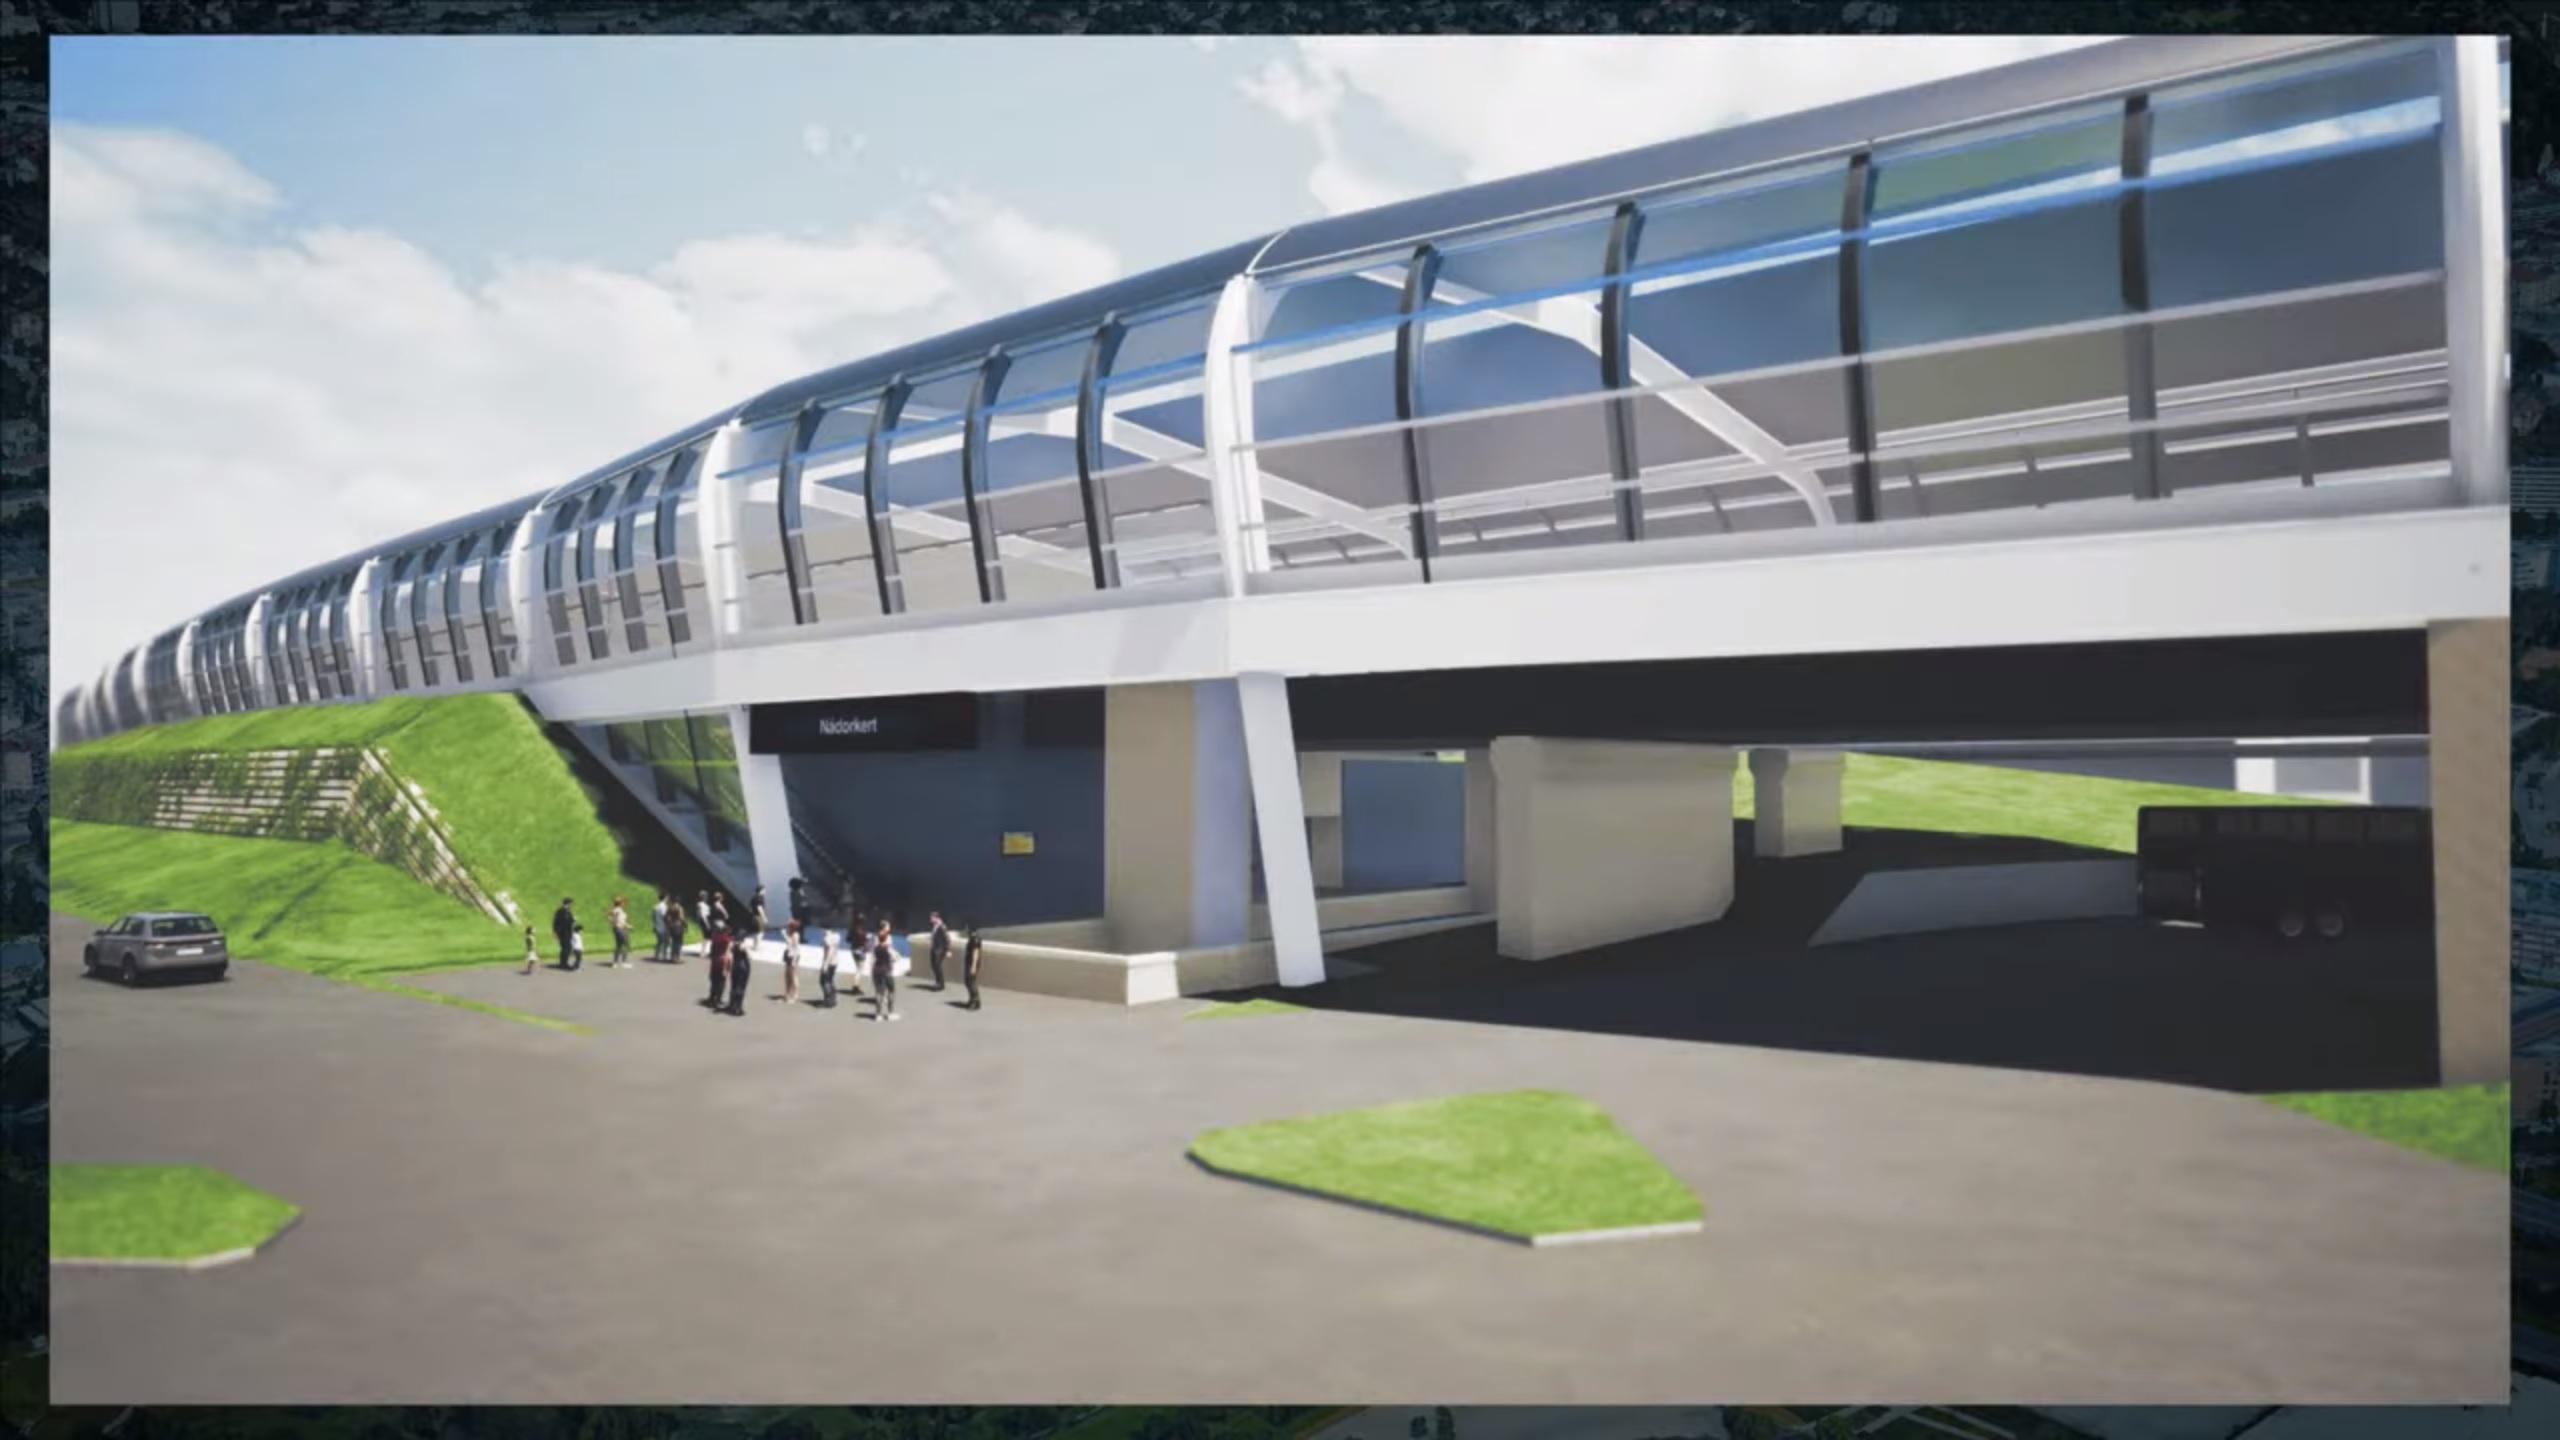 nádorkert station budapest railway 2020